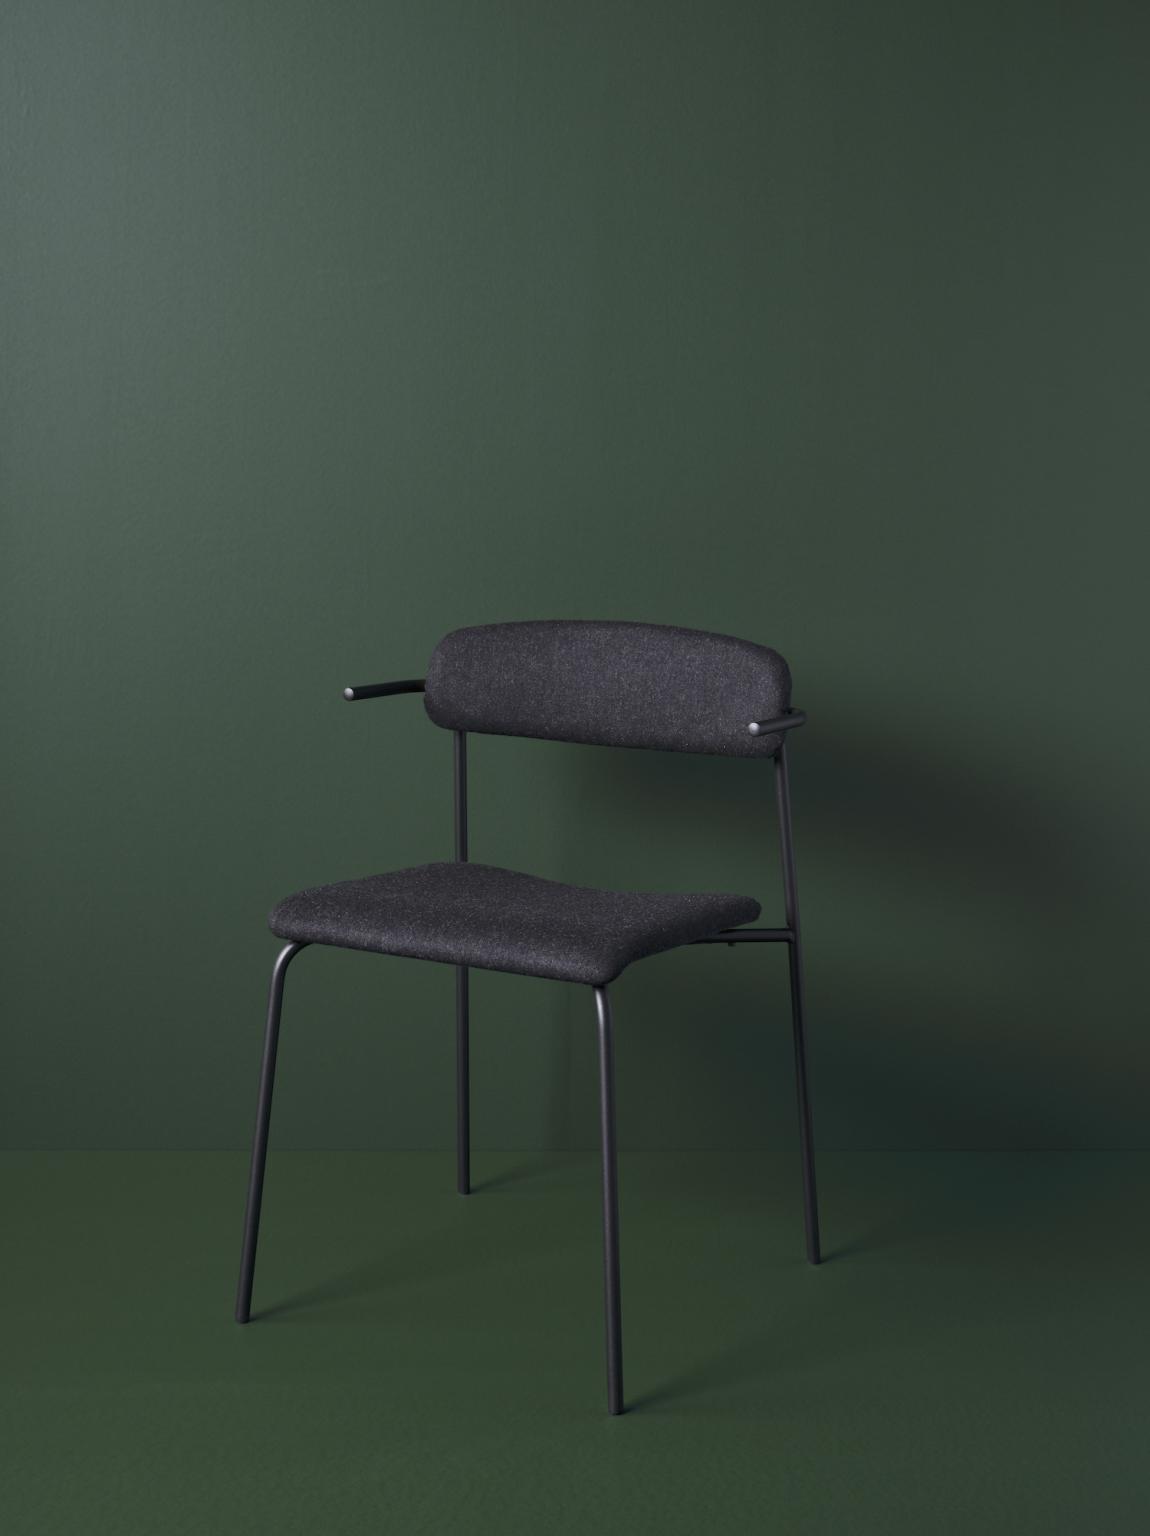 Biennale Interieur - Belgium's leading design and interior event - Peak-chair-fabric.png